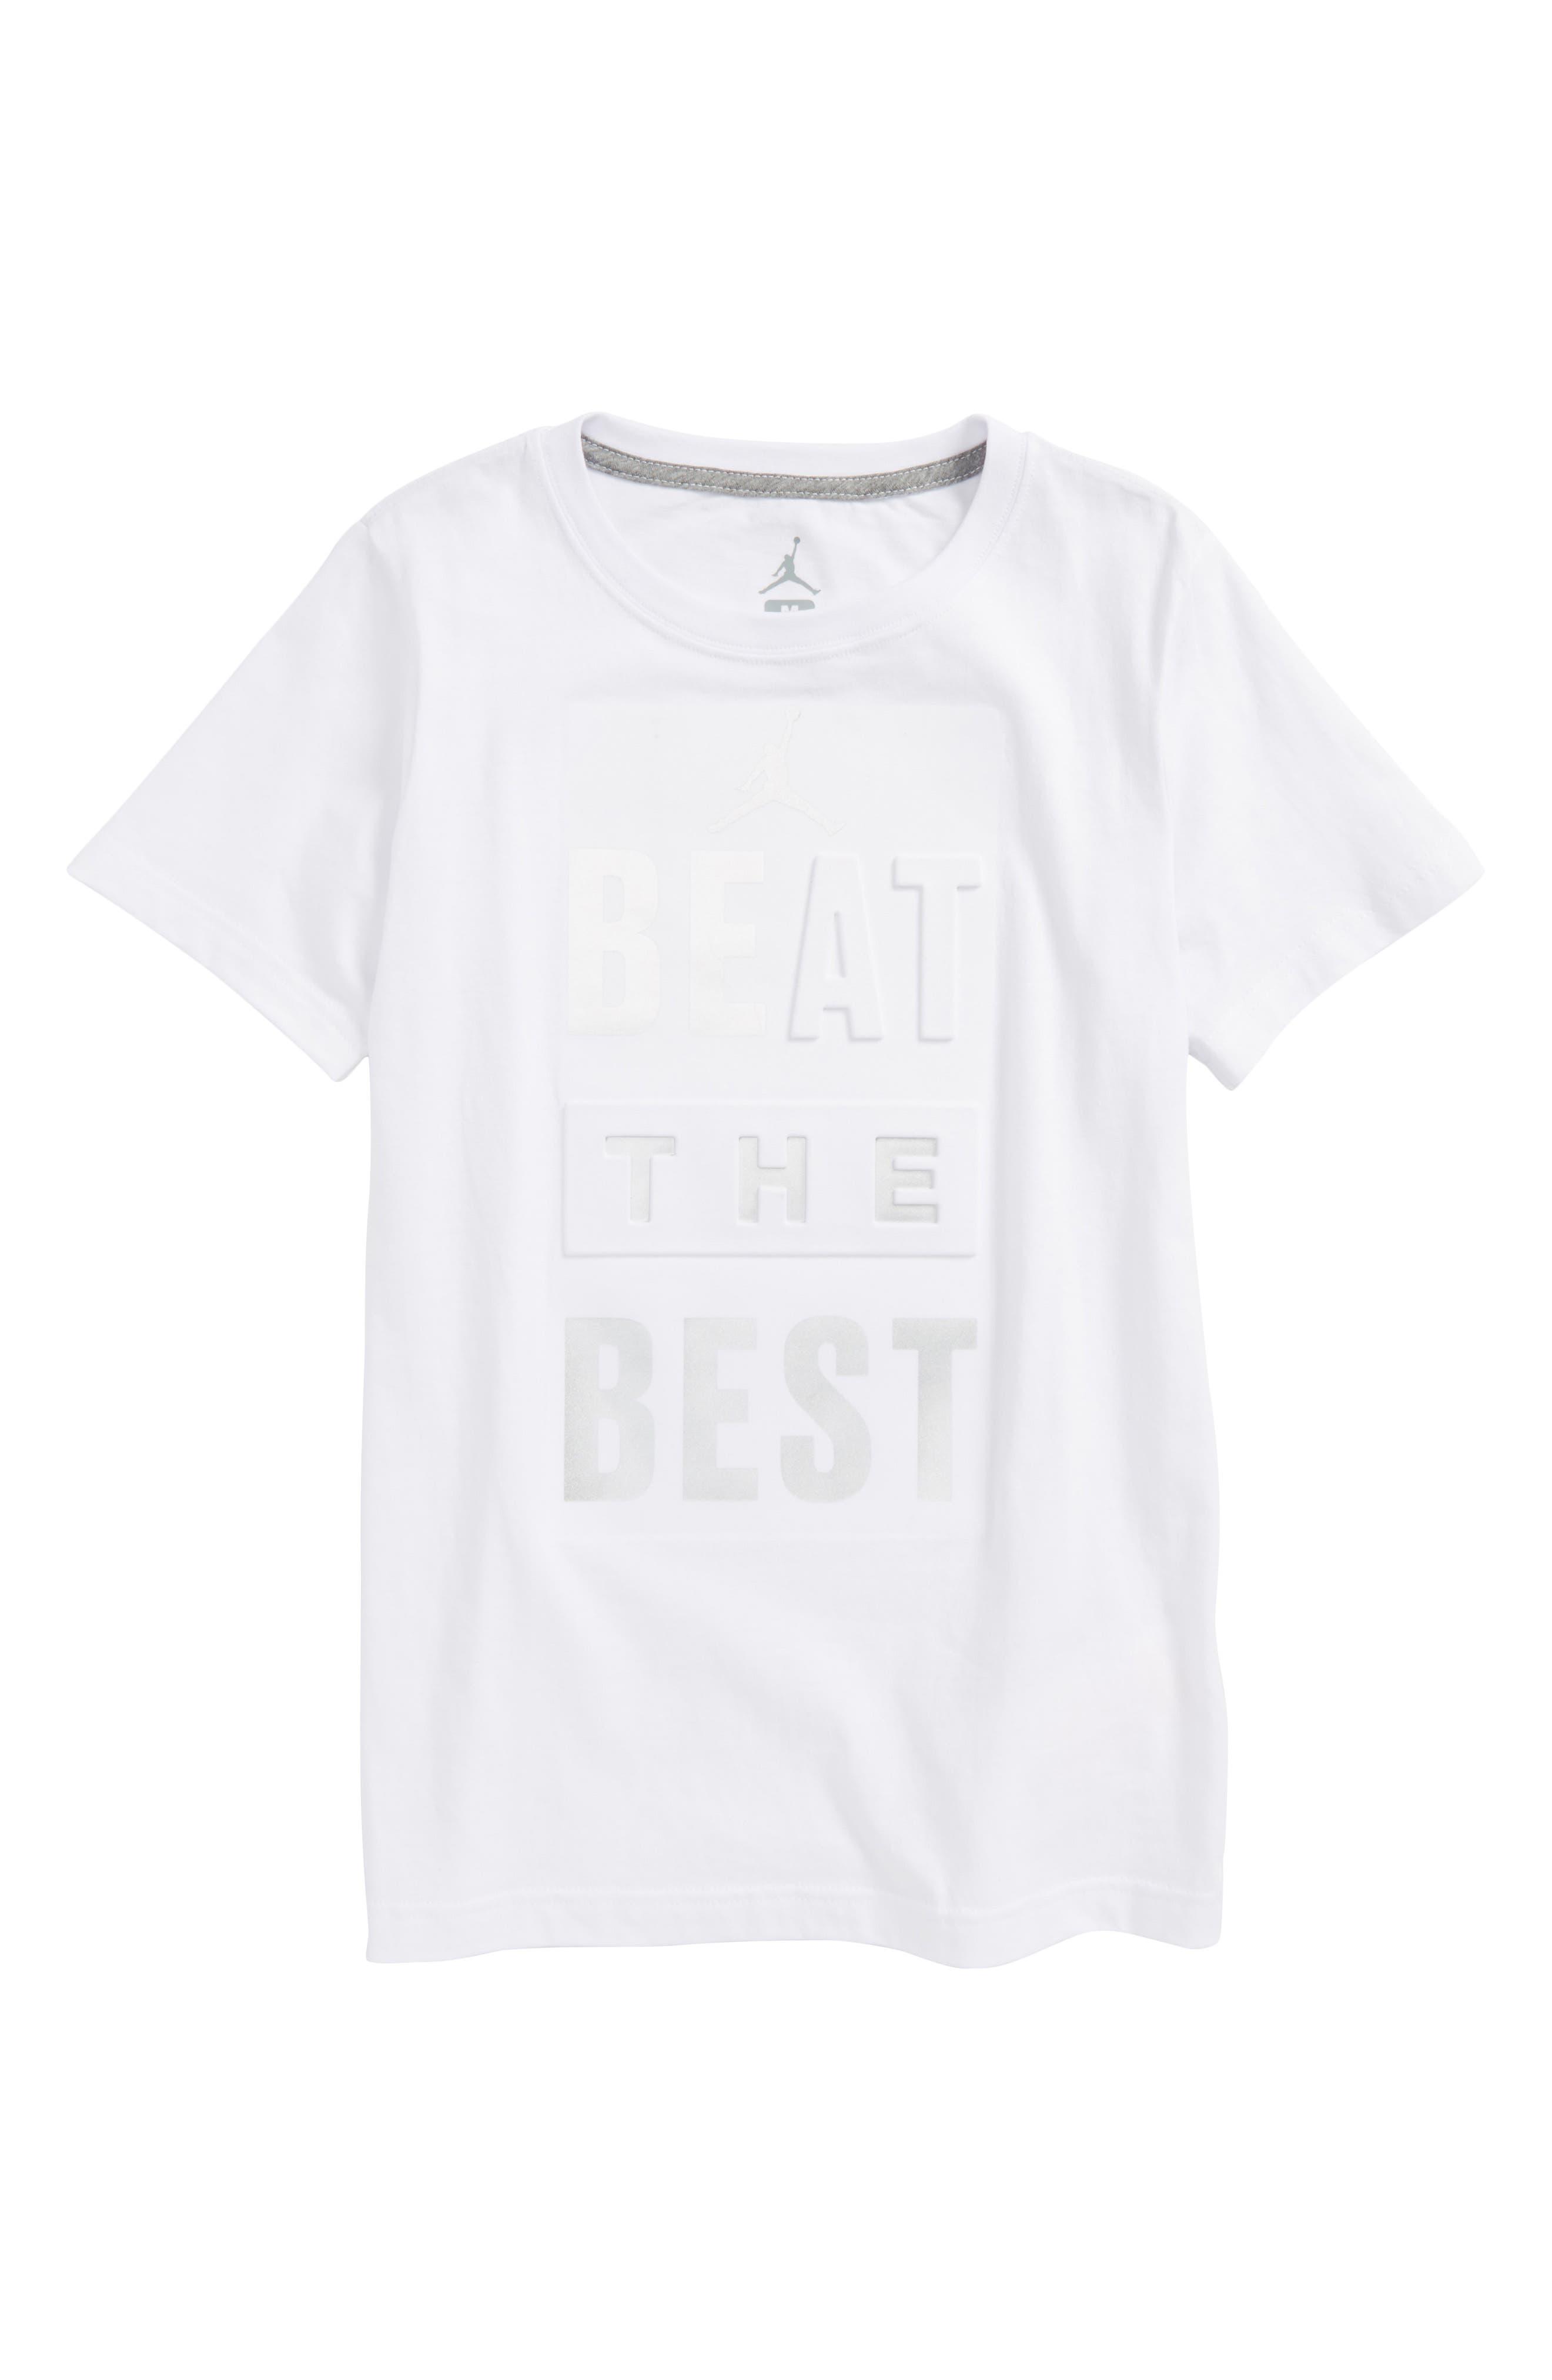 Jordan Beat the Best Graphic T-Shirt,                         Main,                         color, White